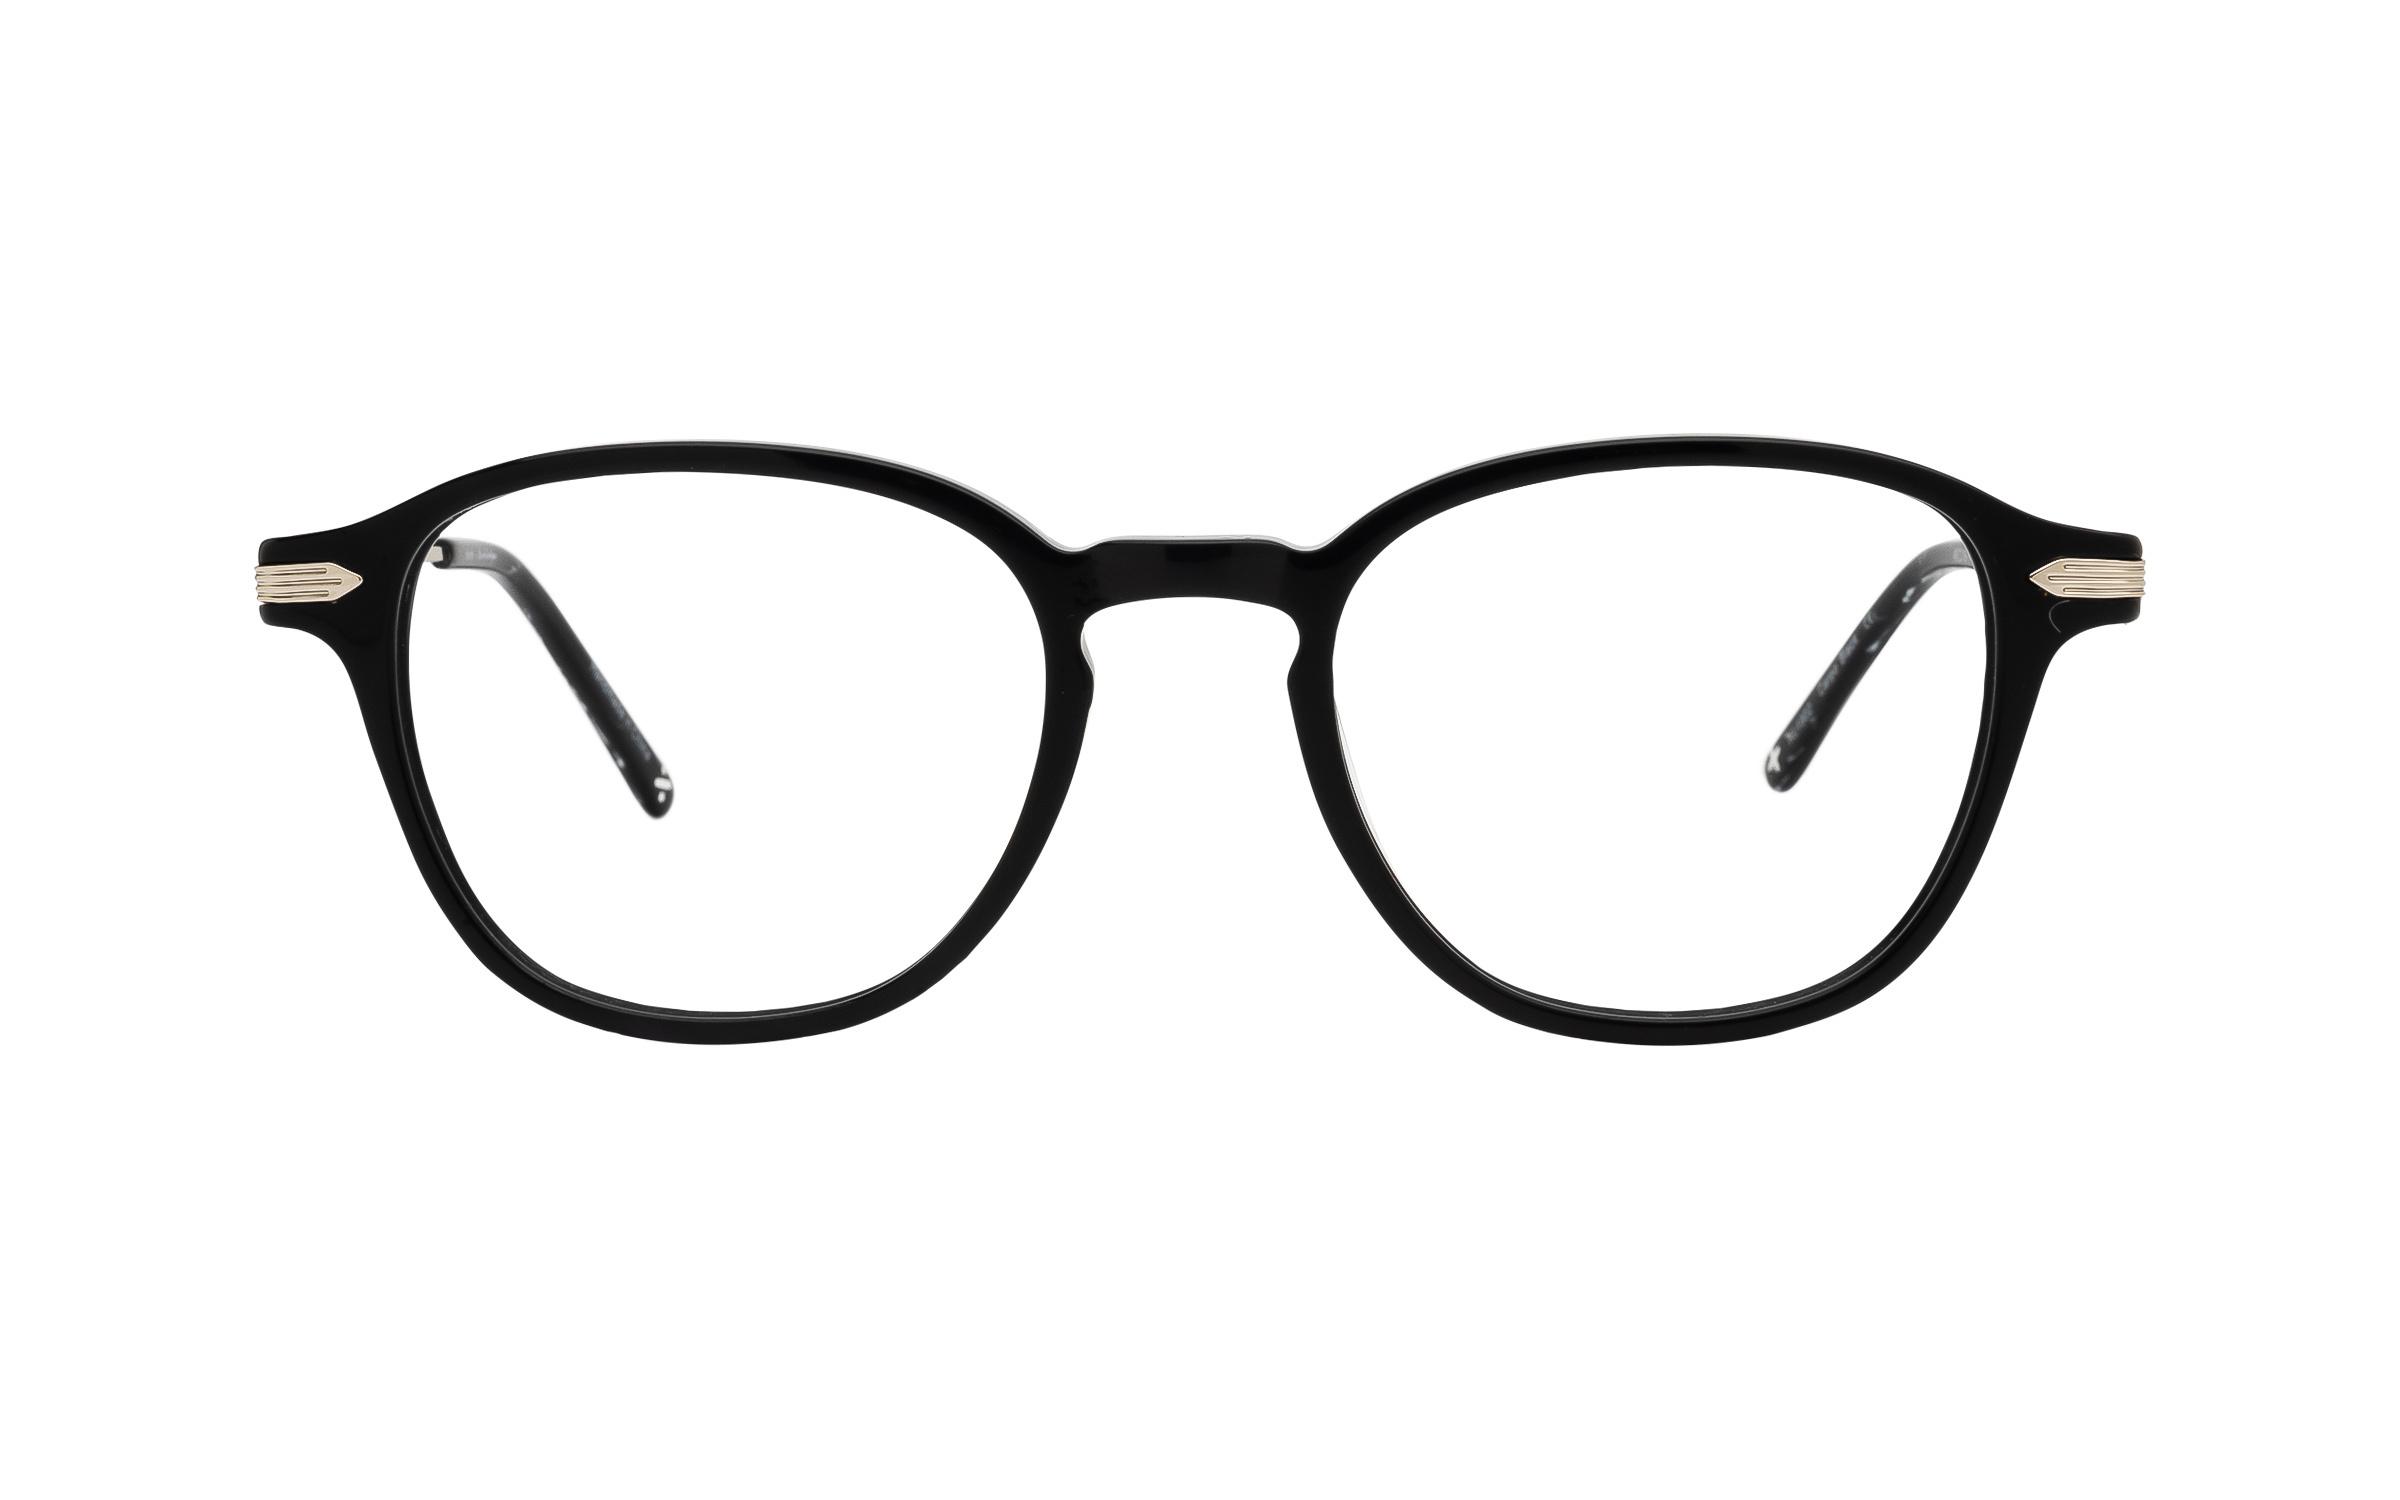 coastal.com - Derek Cardigan Carpo (49) Eyeglasses and Frame in Black | Acetate/Metal – Online Coastal 55.00 USD